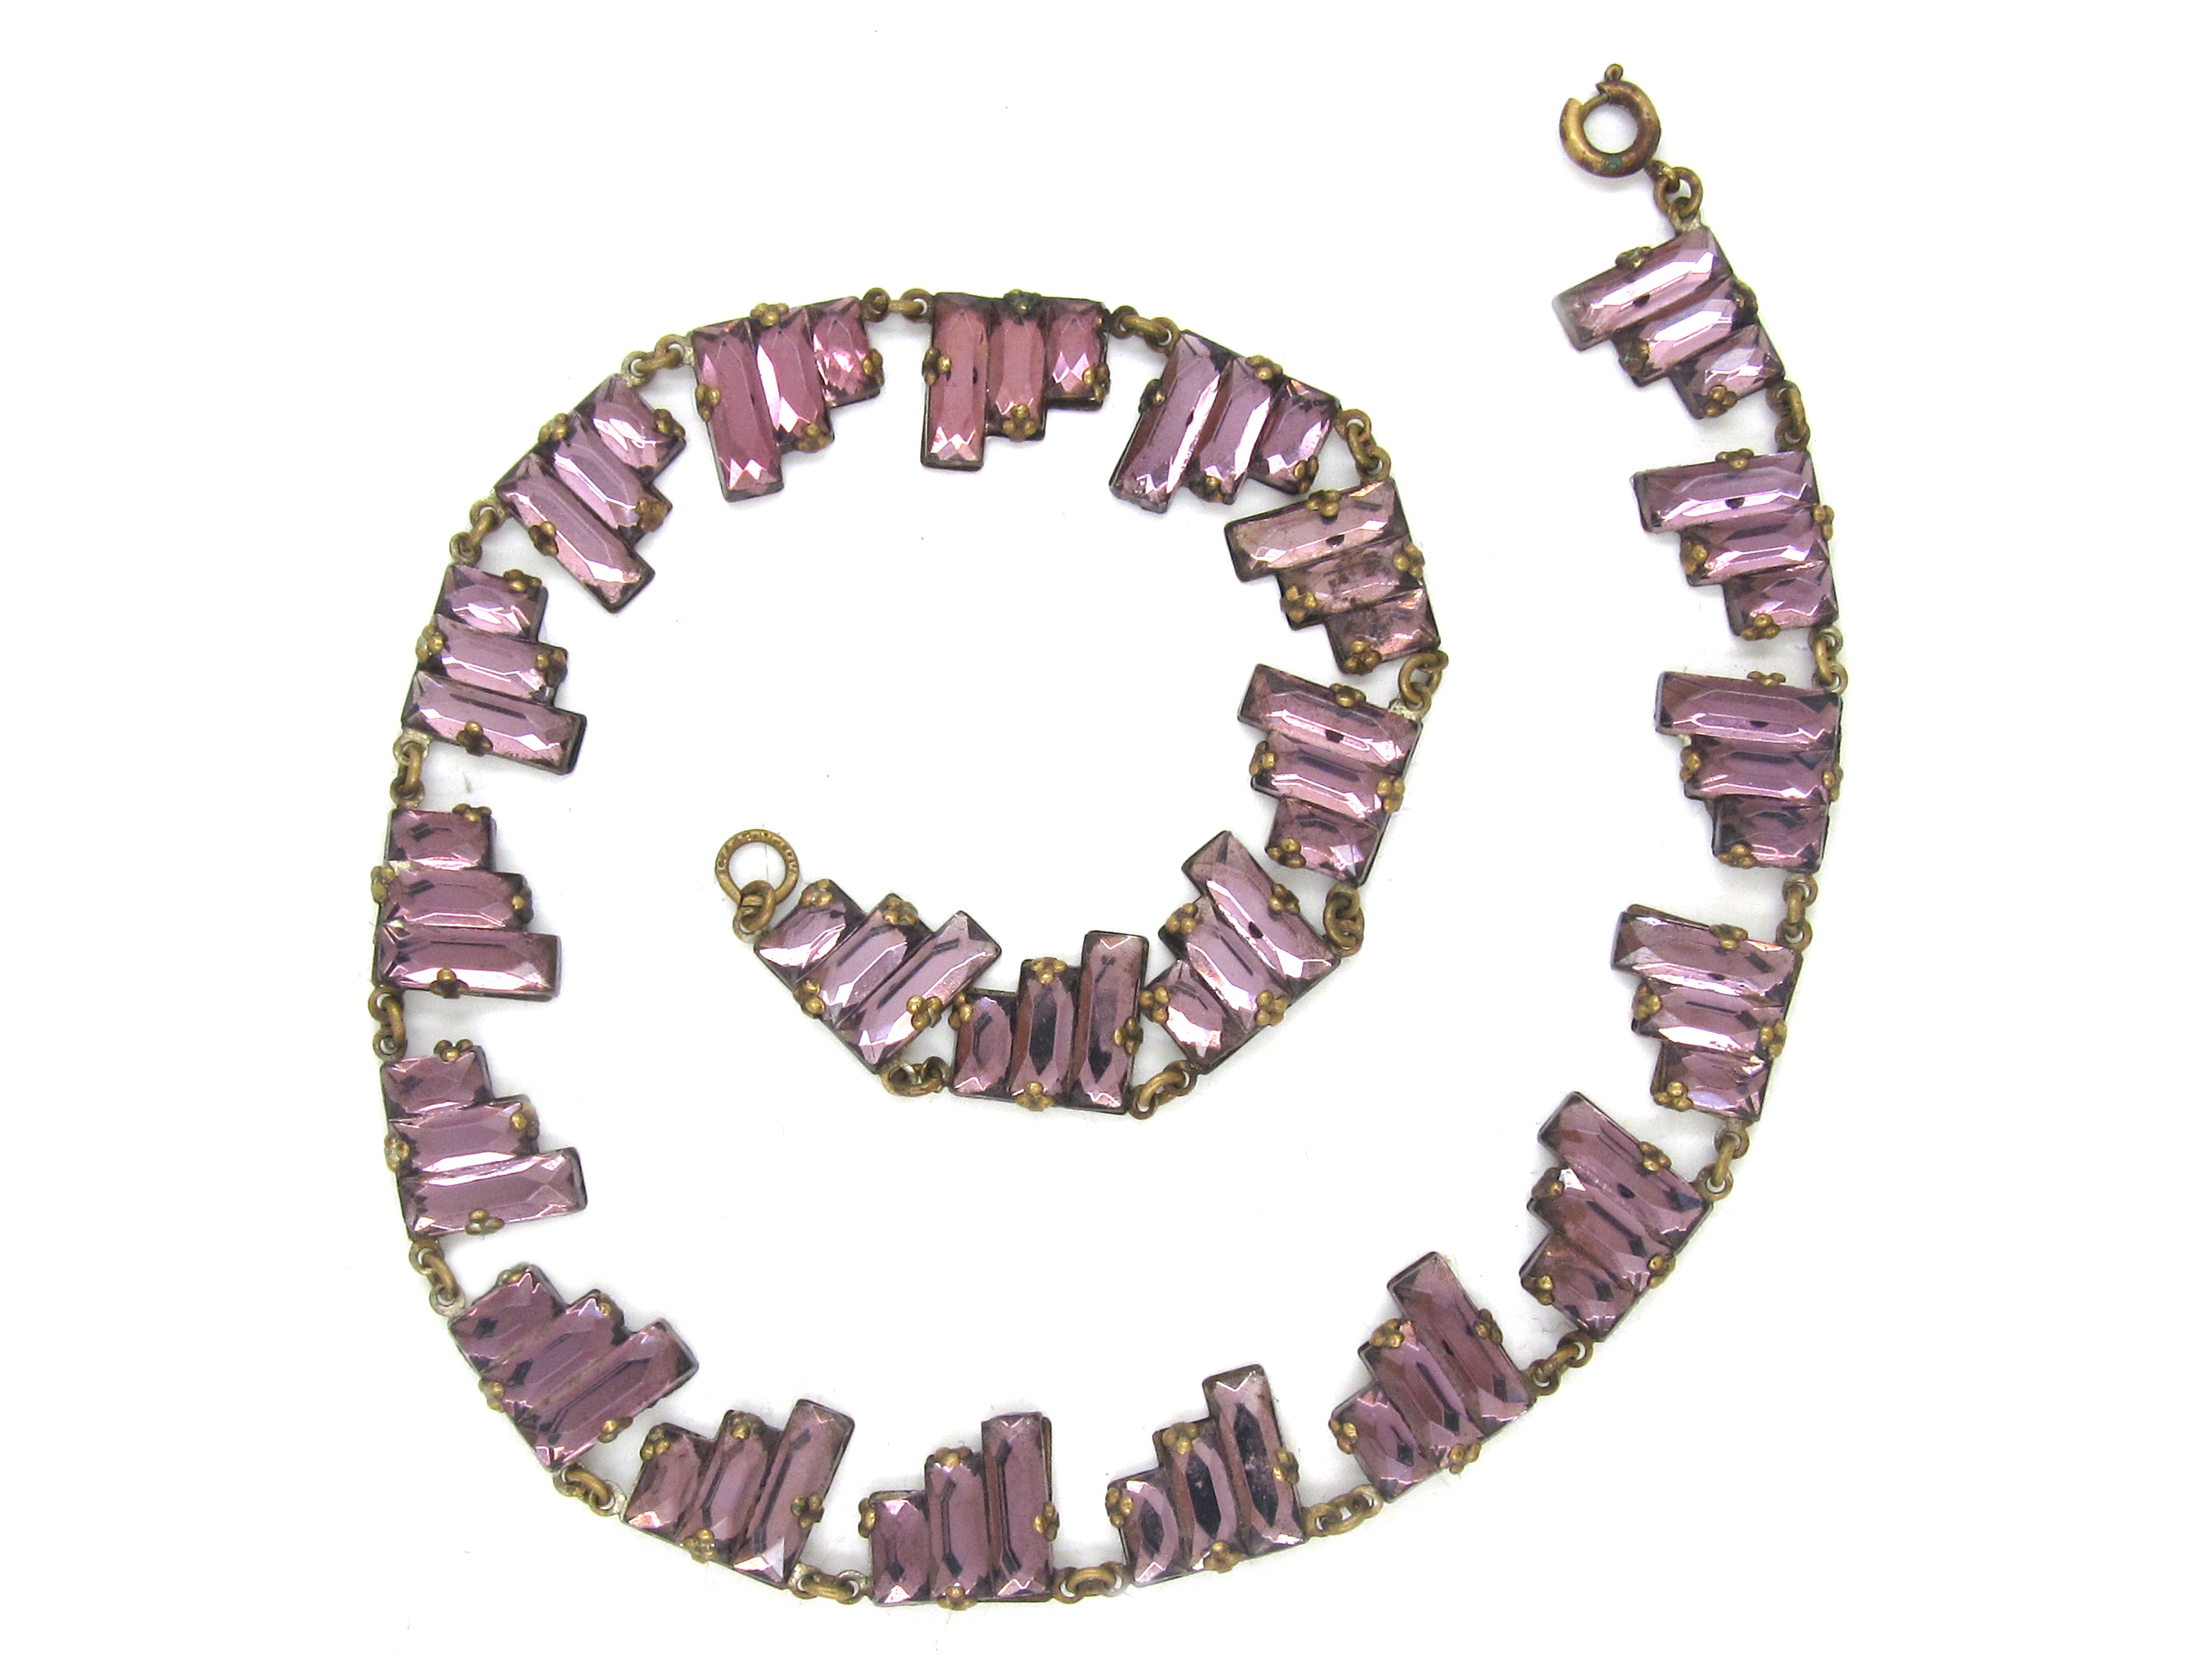 Art Deco Czechoslovakian Mauve Glass Necklace